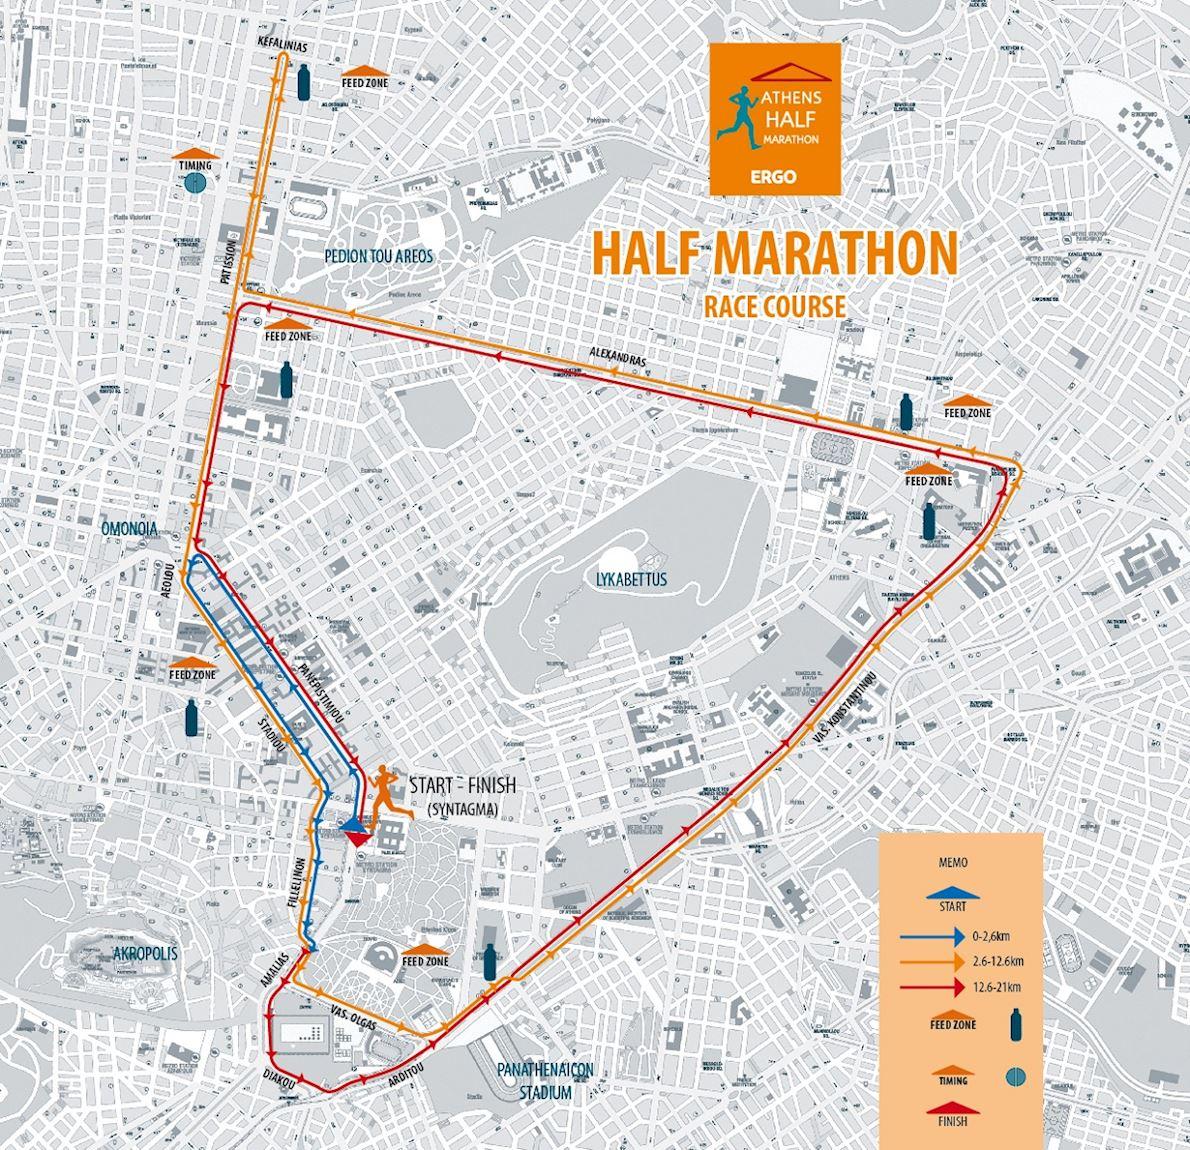 Athens Half Marathon 路线图